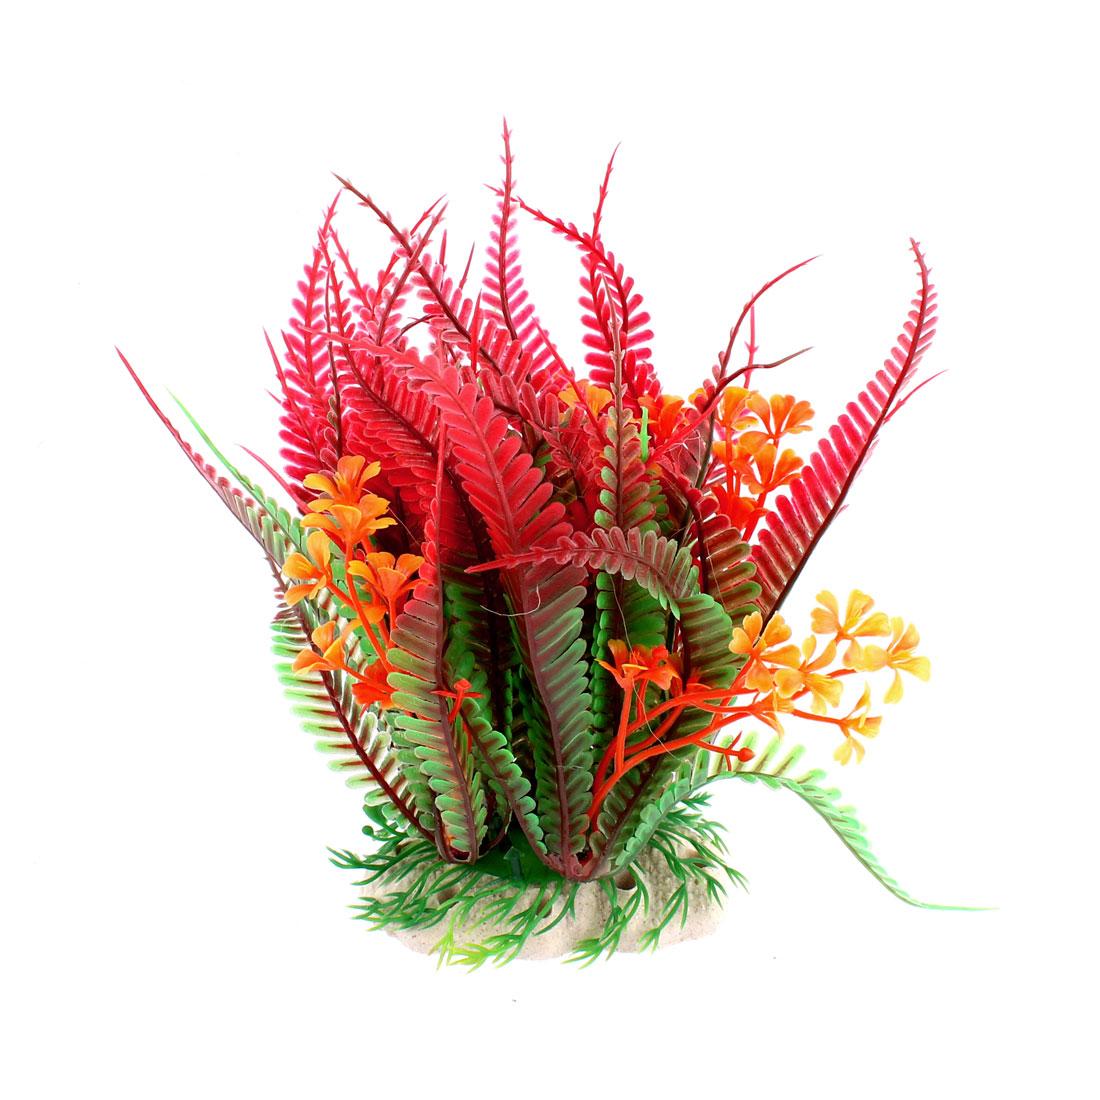 Aquarium Imitated Plastic Water Plant Grass Decoration Red Green 18.5cm High